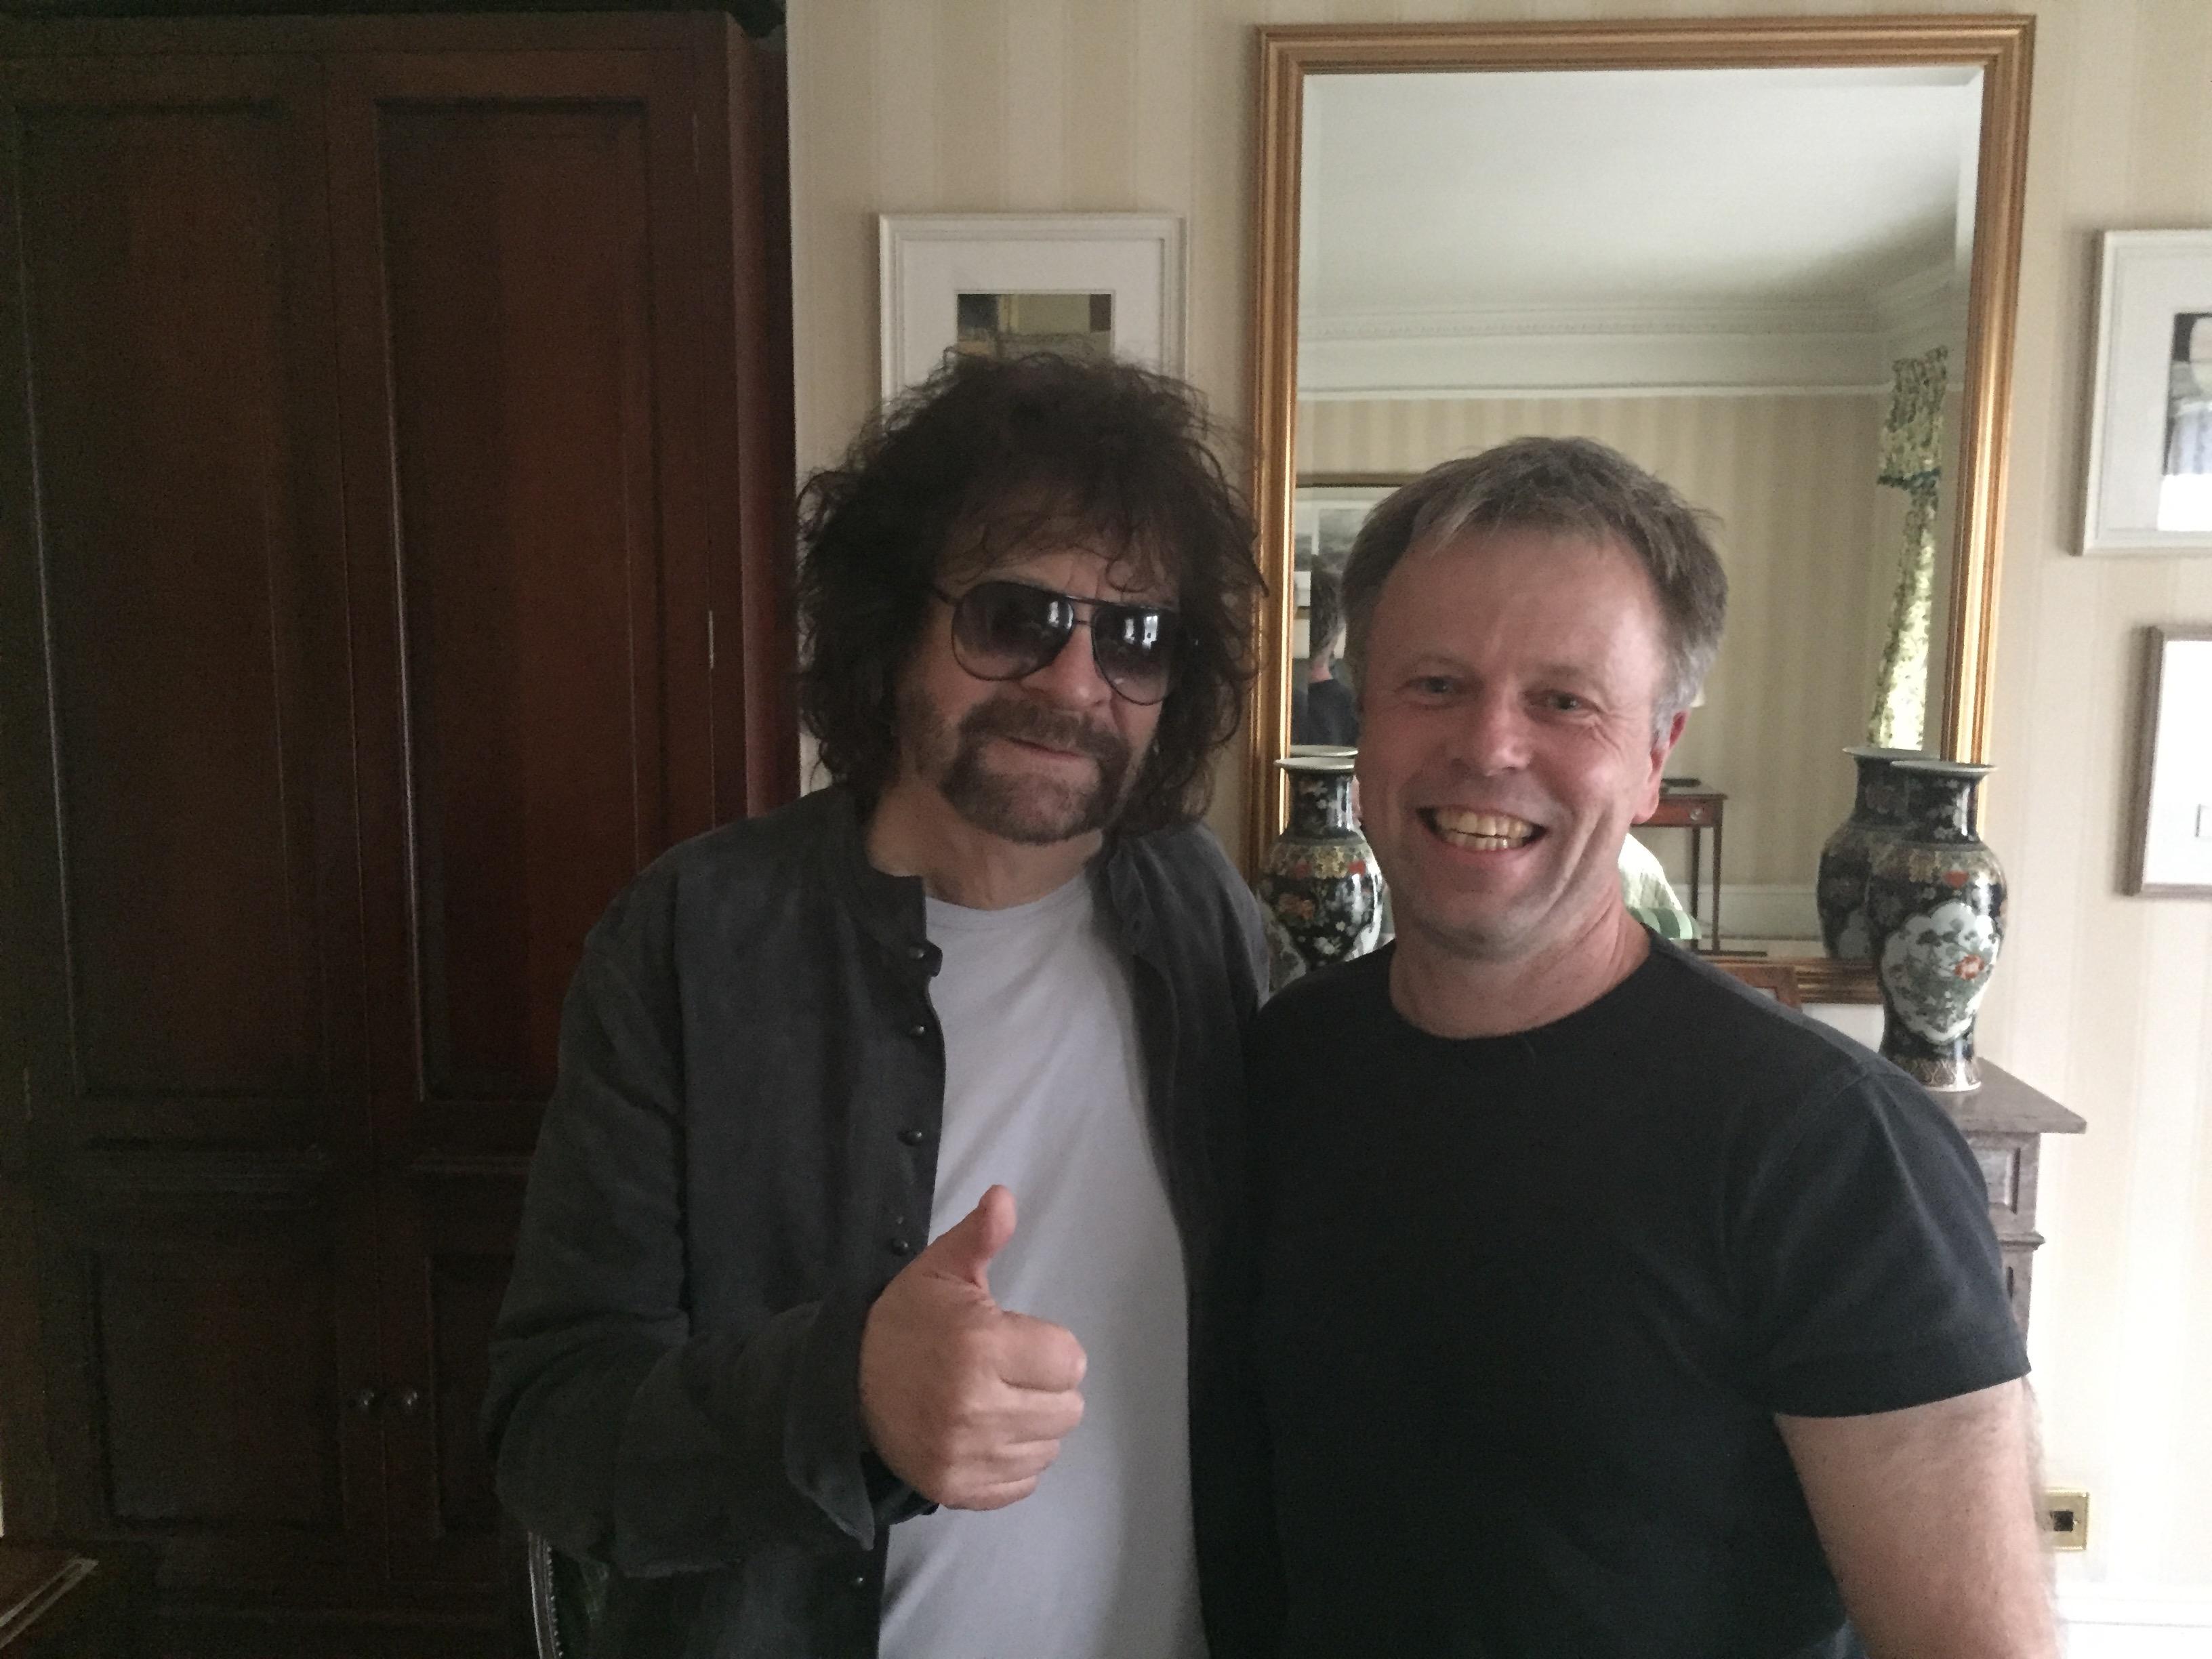 Jeff Lynne and Michael